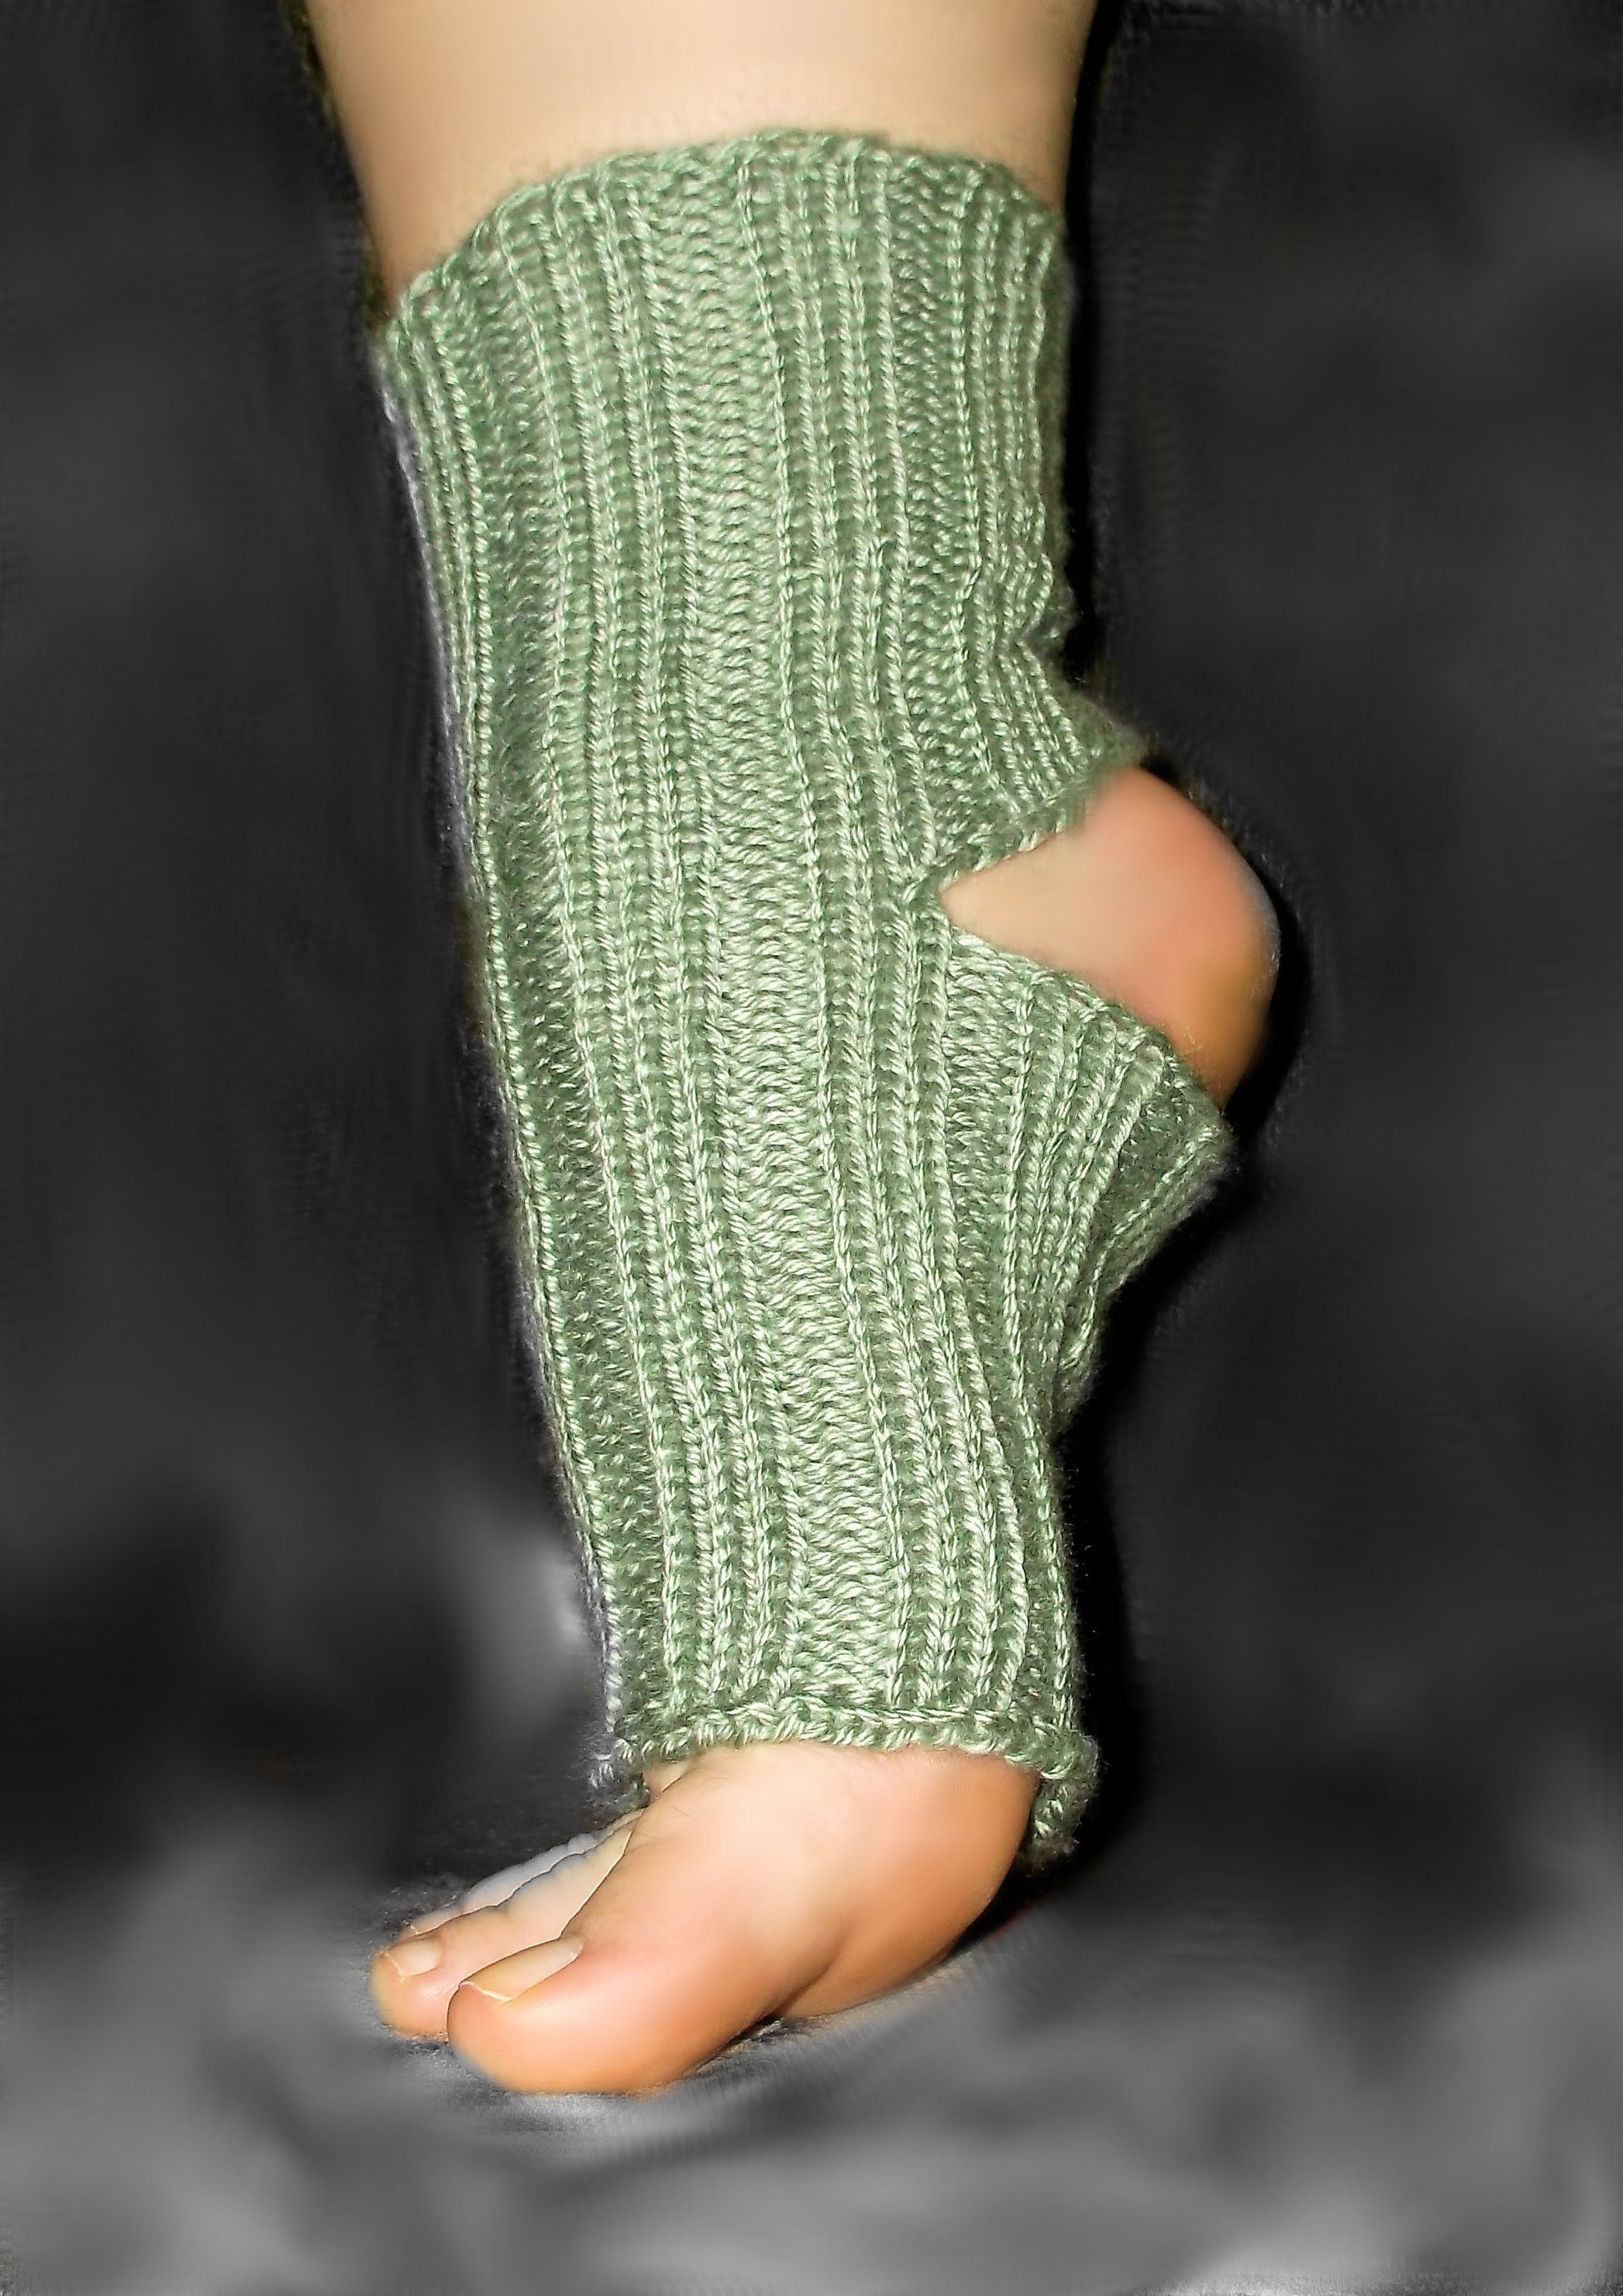 How To Loom Knit Yoga Socks | Loom Knitting Tutorials - Patterens ...